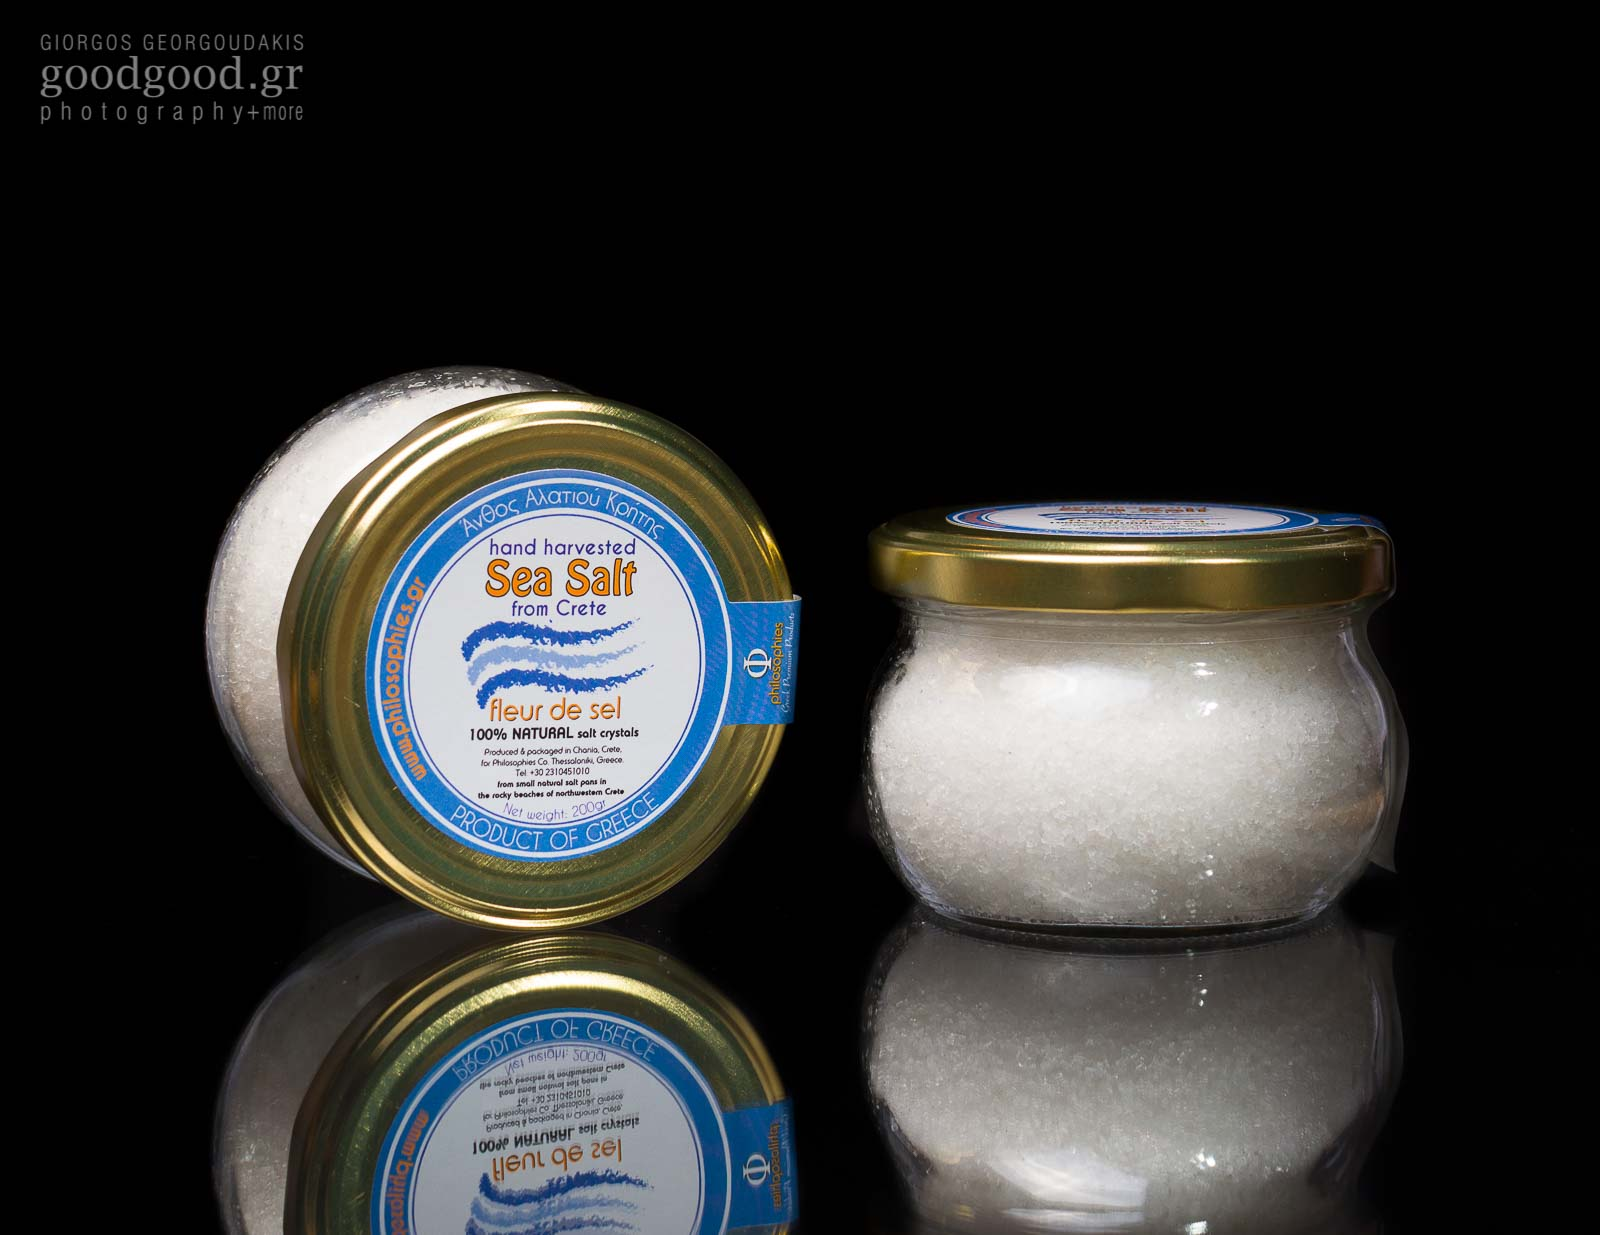 Product photography in dark background. Vases of sea salt (Crete fleur de sel)